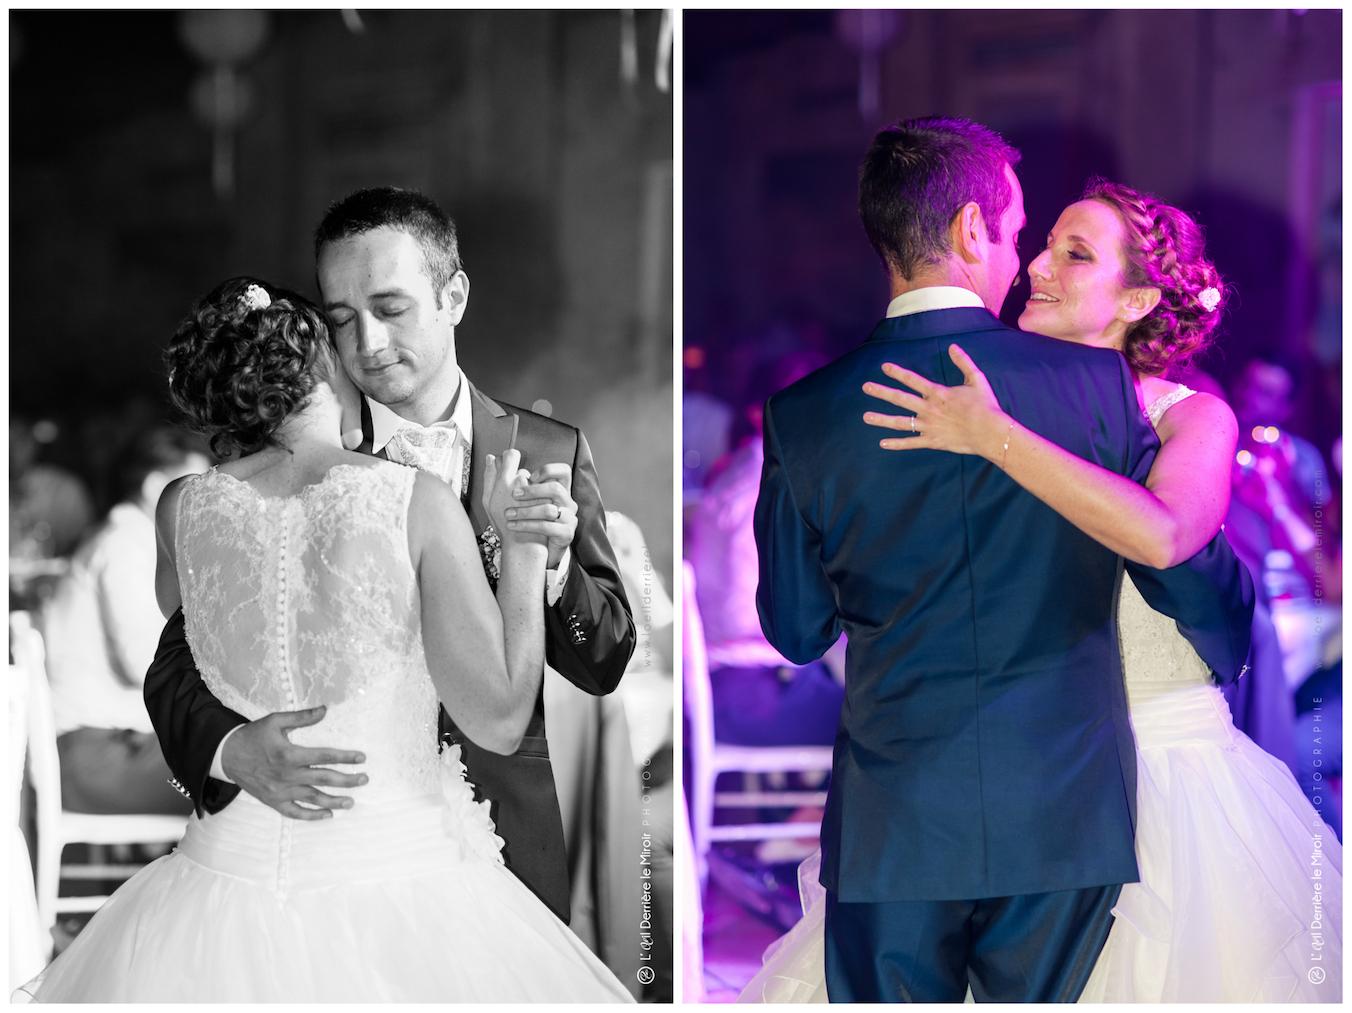 photographe-mariage-06-chateau-vaugrenier-21